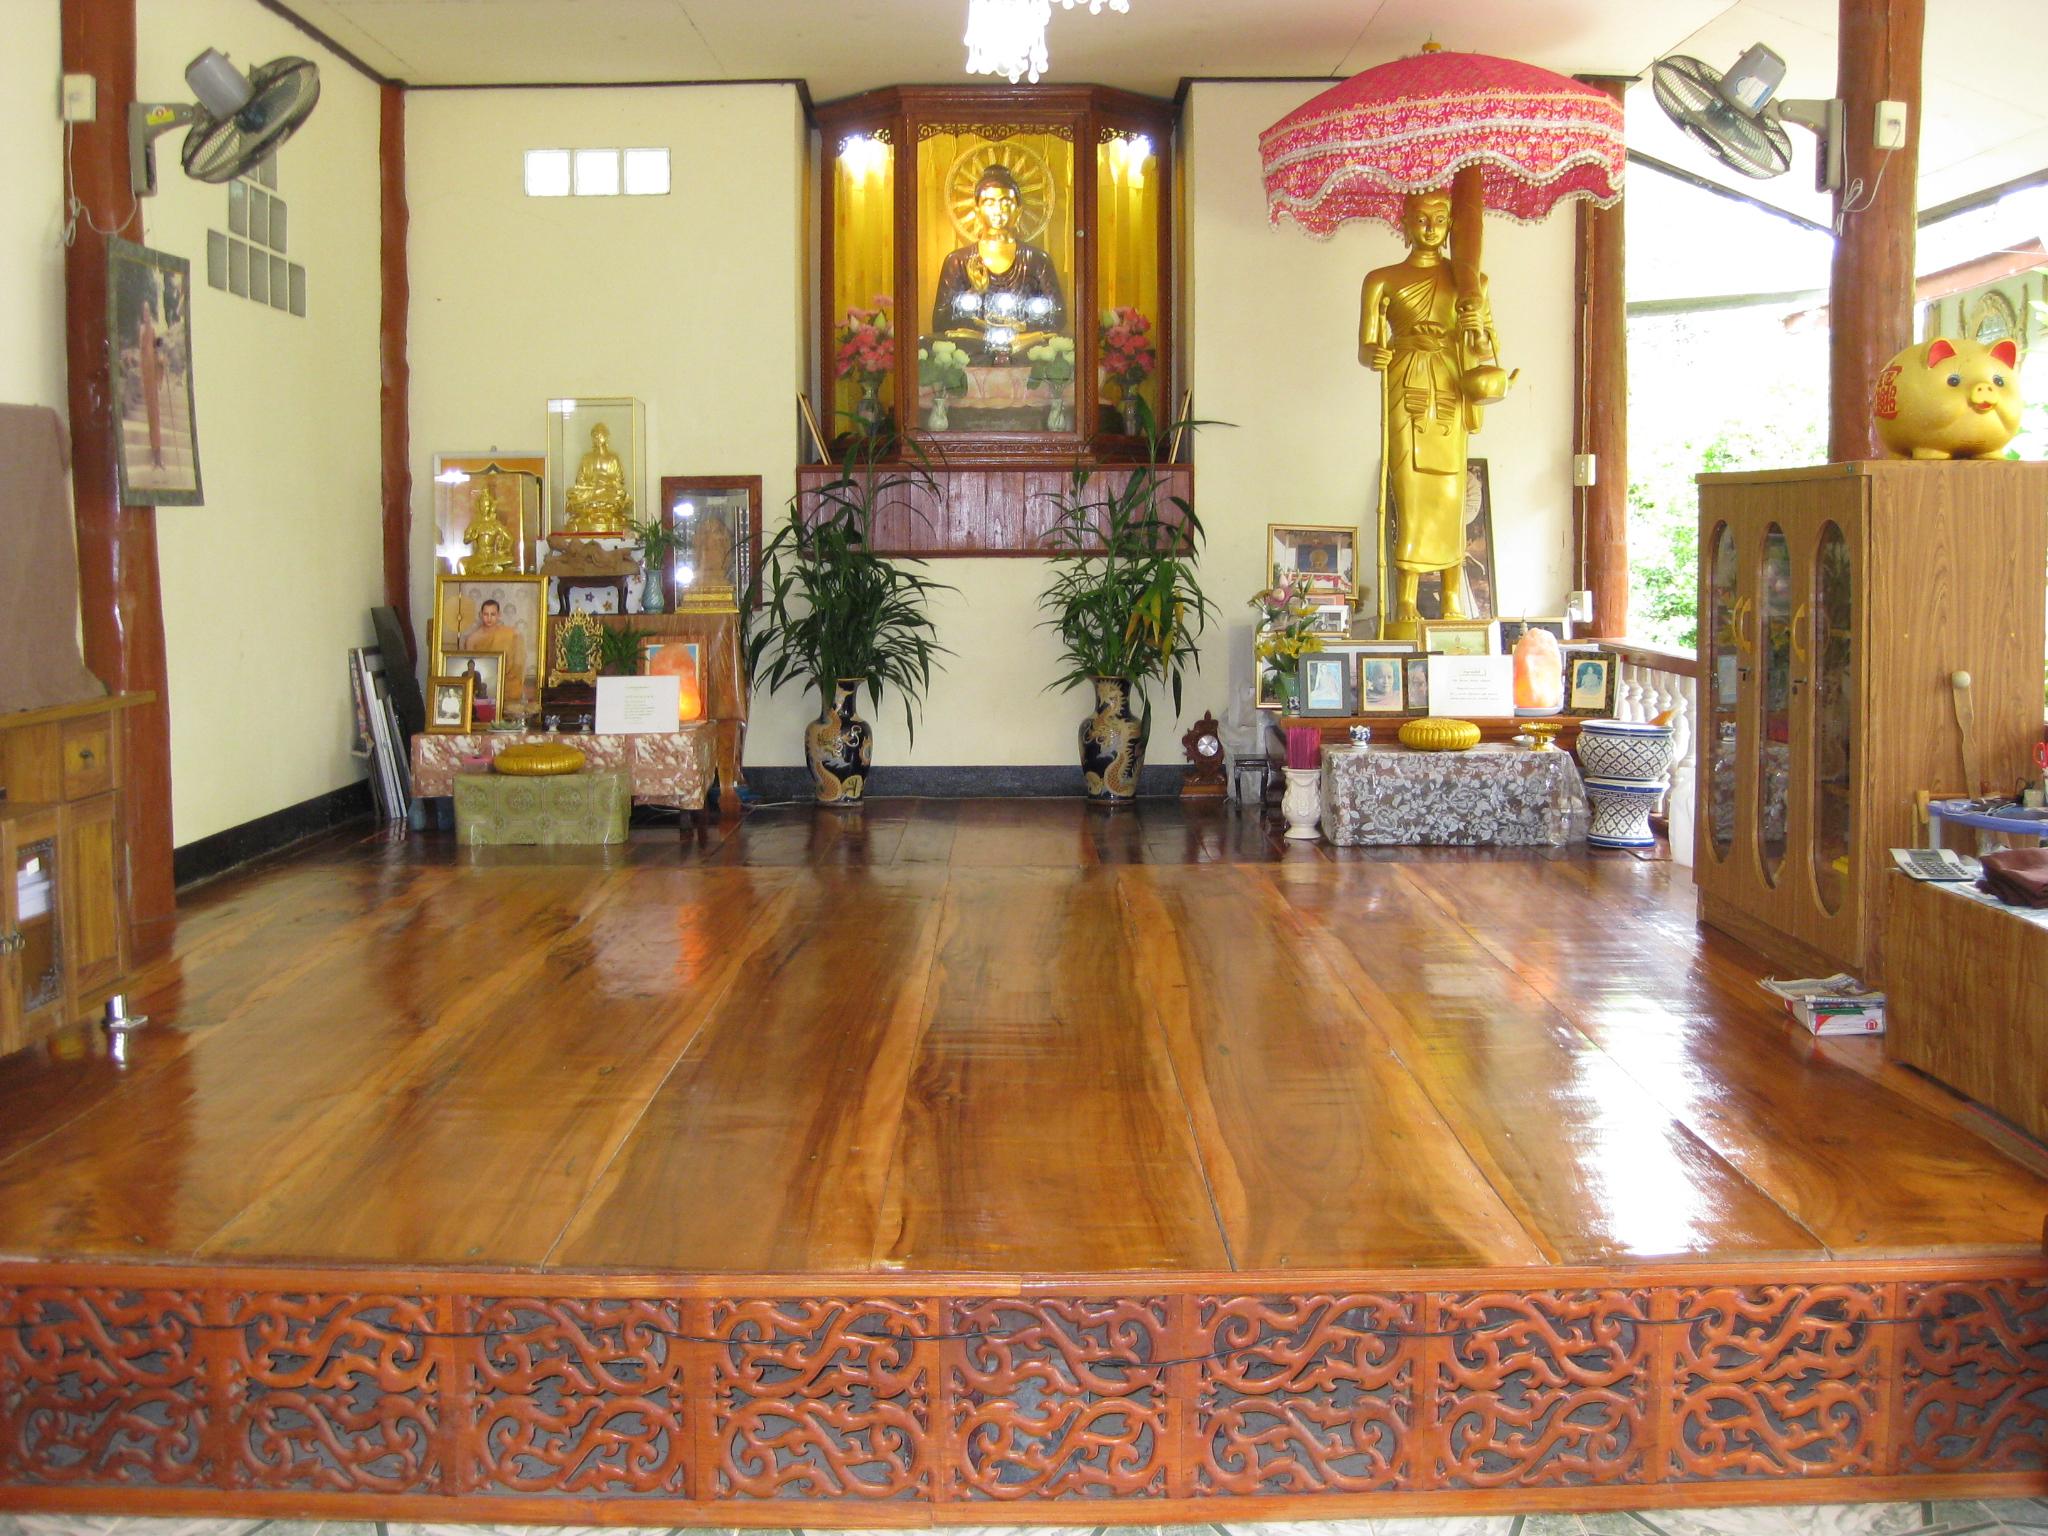 4. Meeting Area (起居厅)